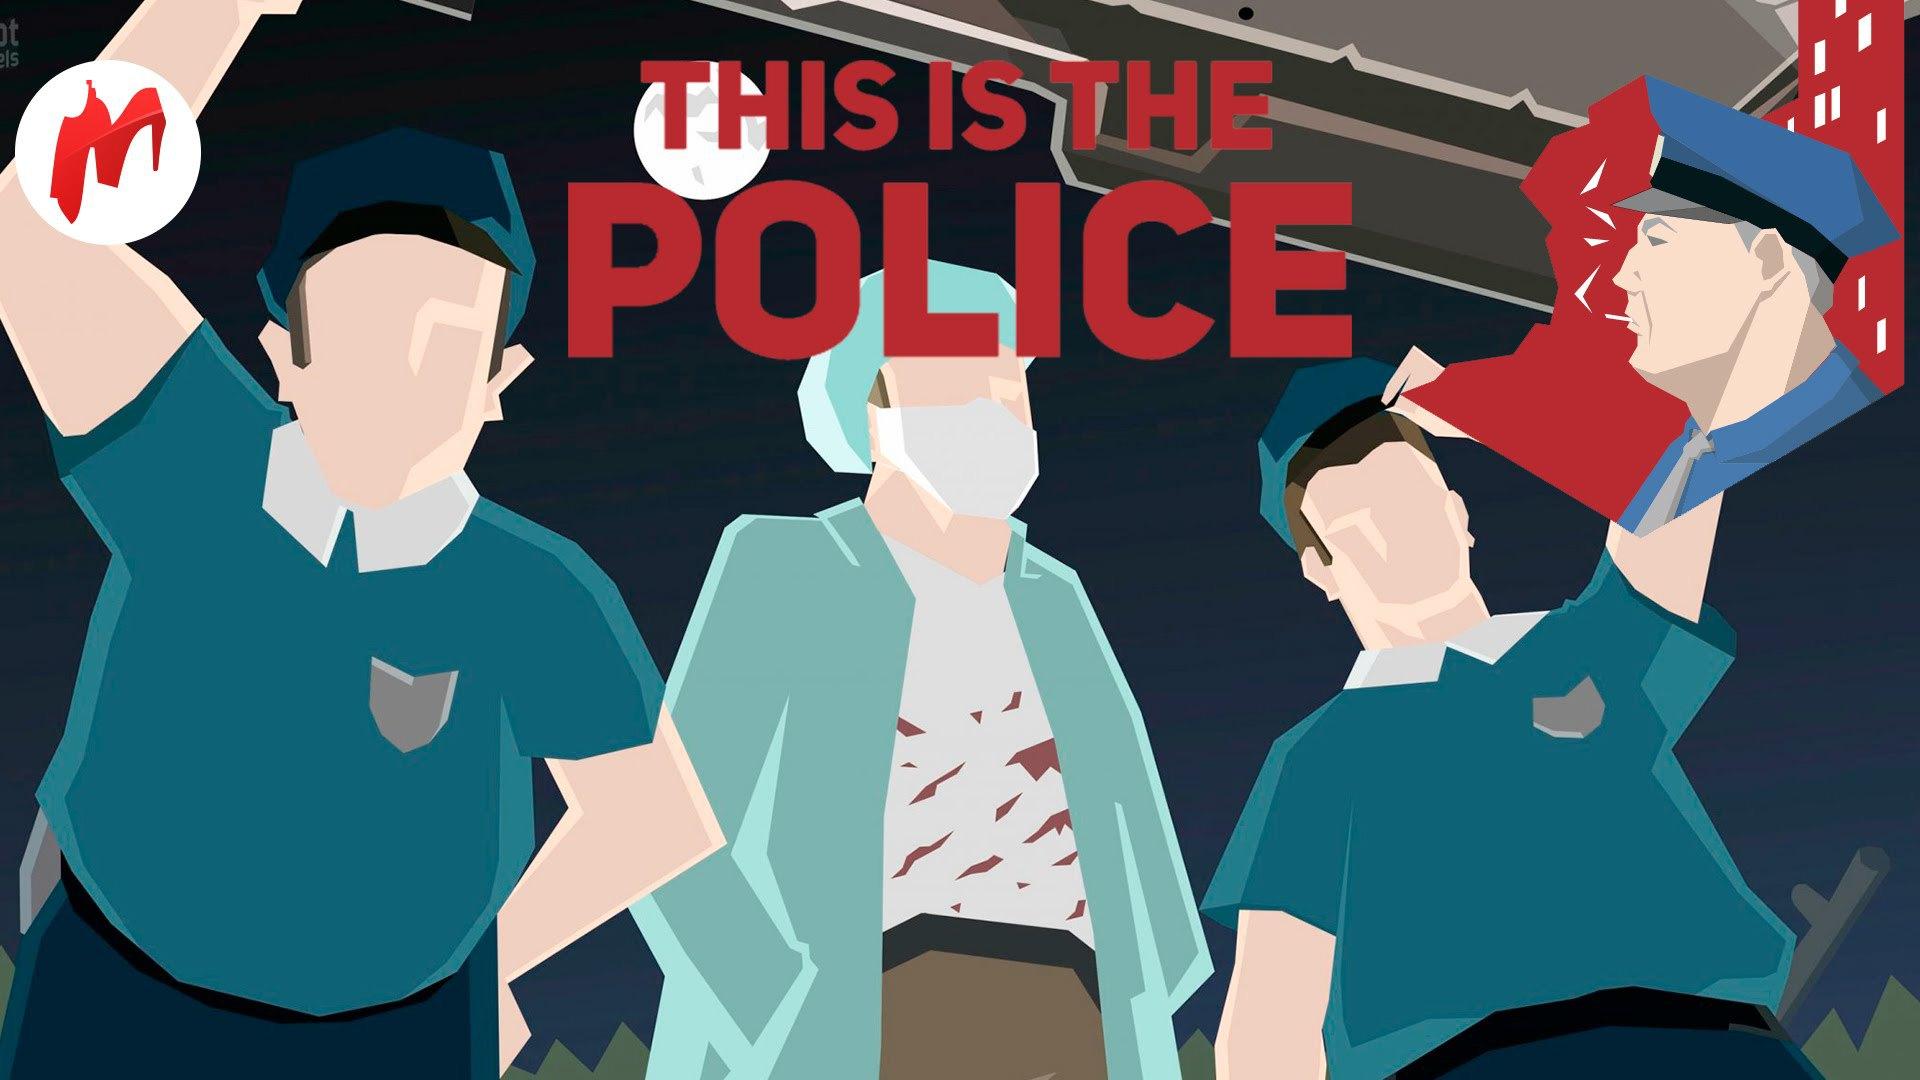 This isthe Police выйдет намобильные платформы вдекабре